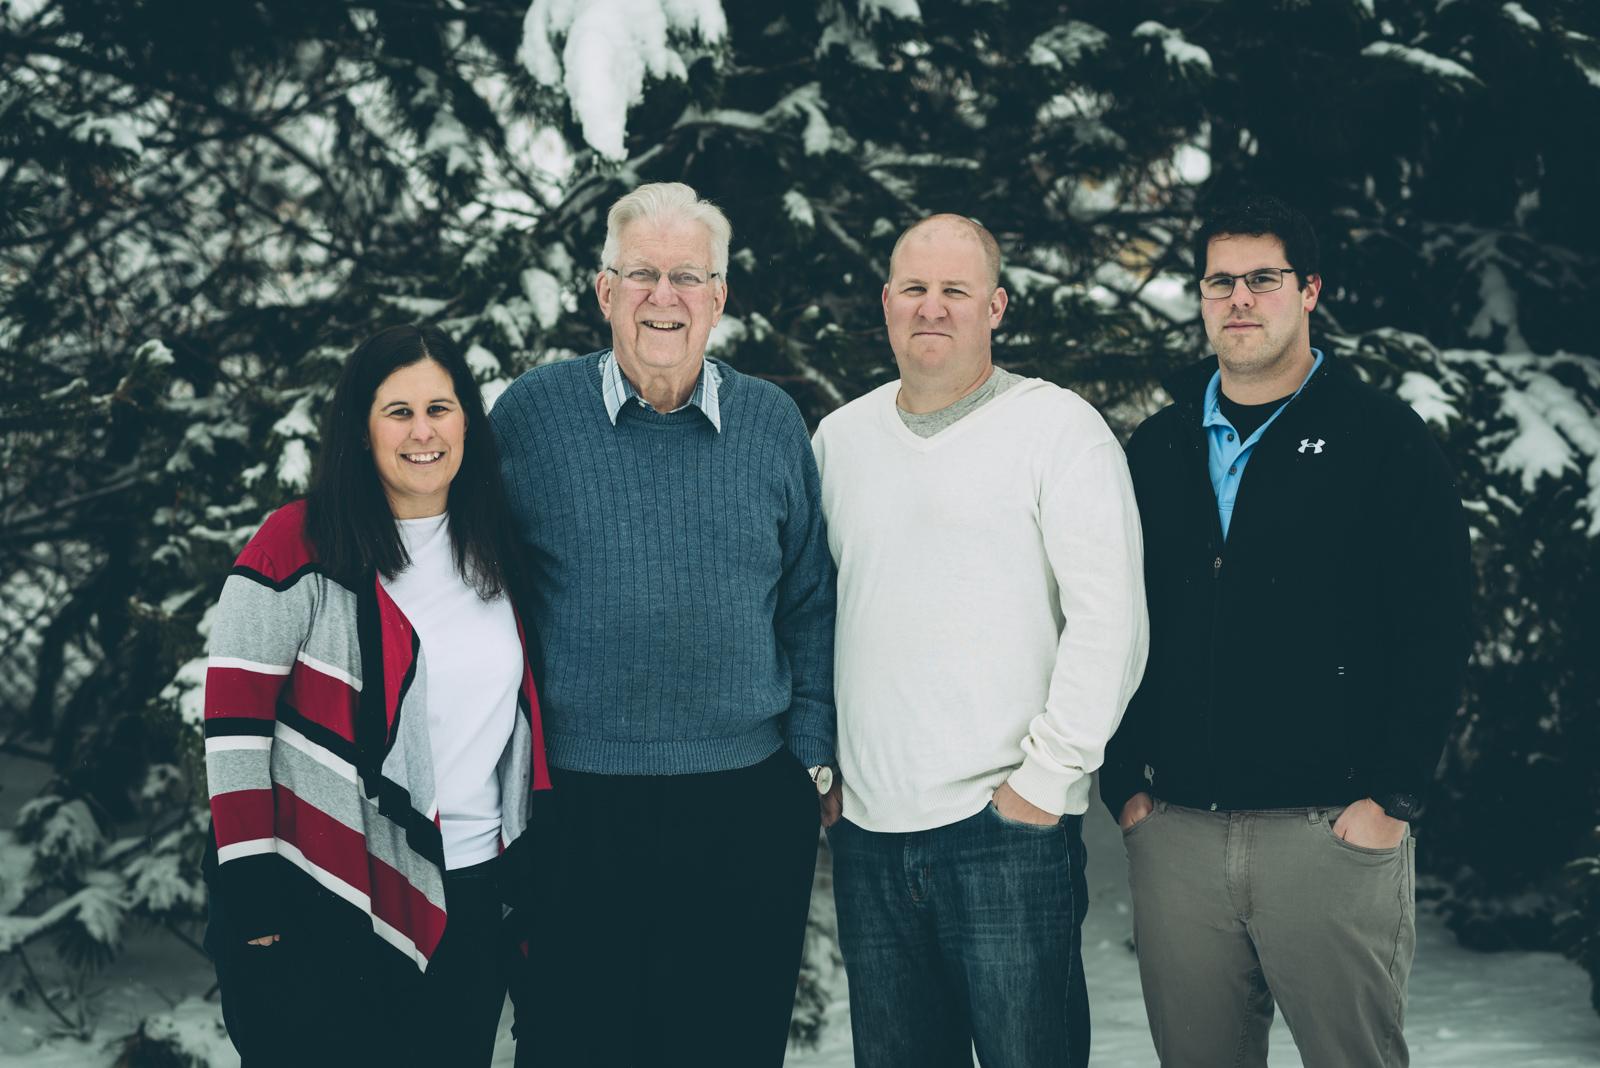 ashlyn-family-portraits-blog-31.jpg